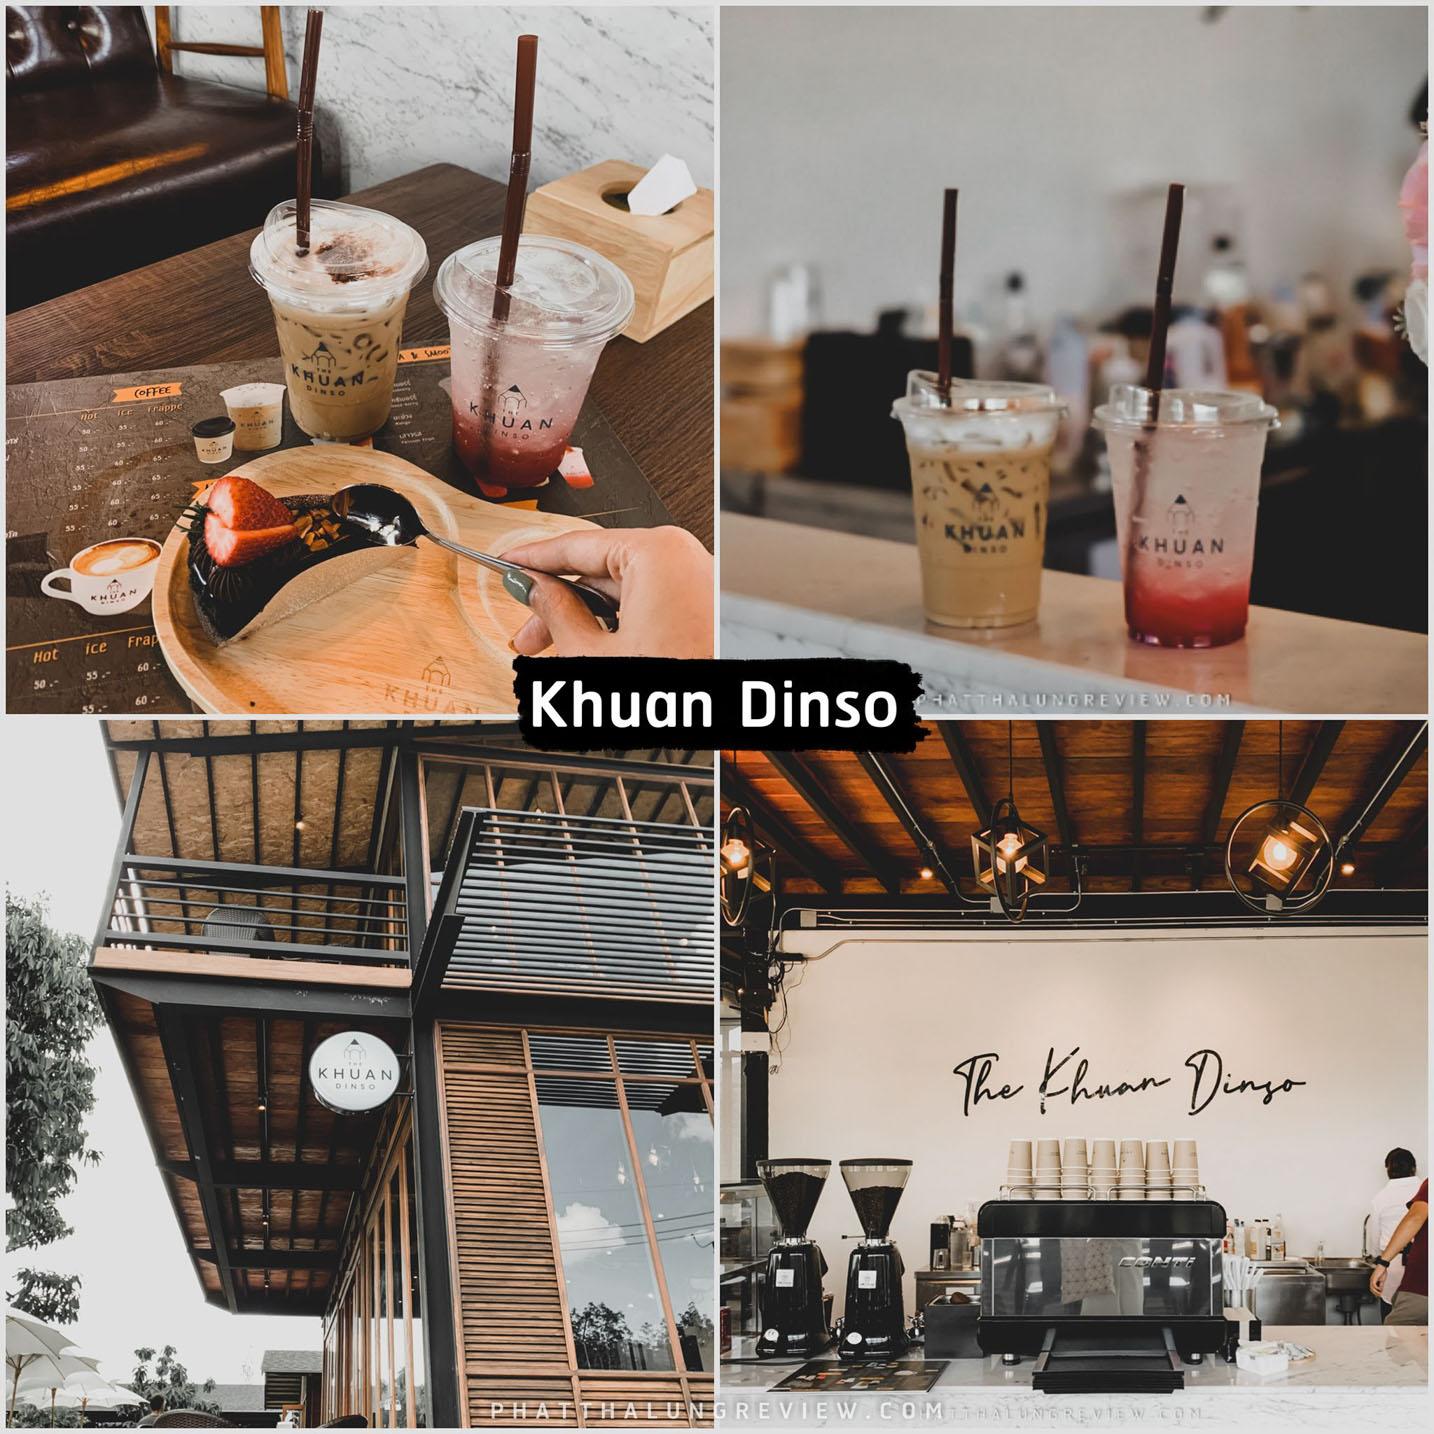 The khuan dinso ร้านเก๋ๆ ตกแต่งน่ารักบรรยากาศร้านดี เมนูอาหารมีให้เลือกเพียบบ 10/10!